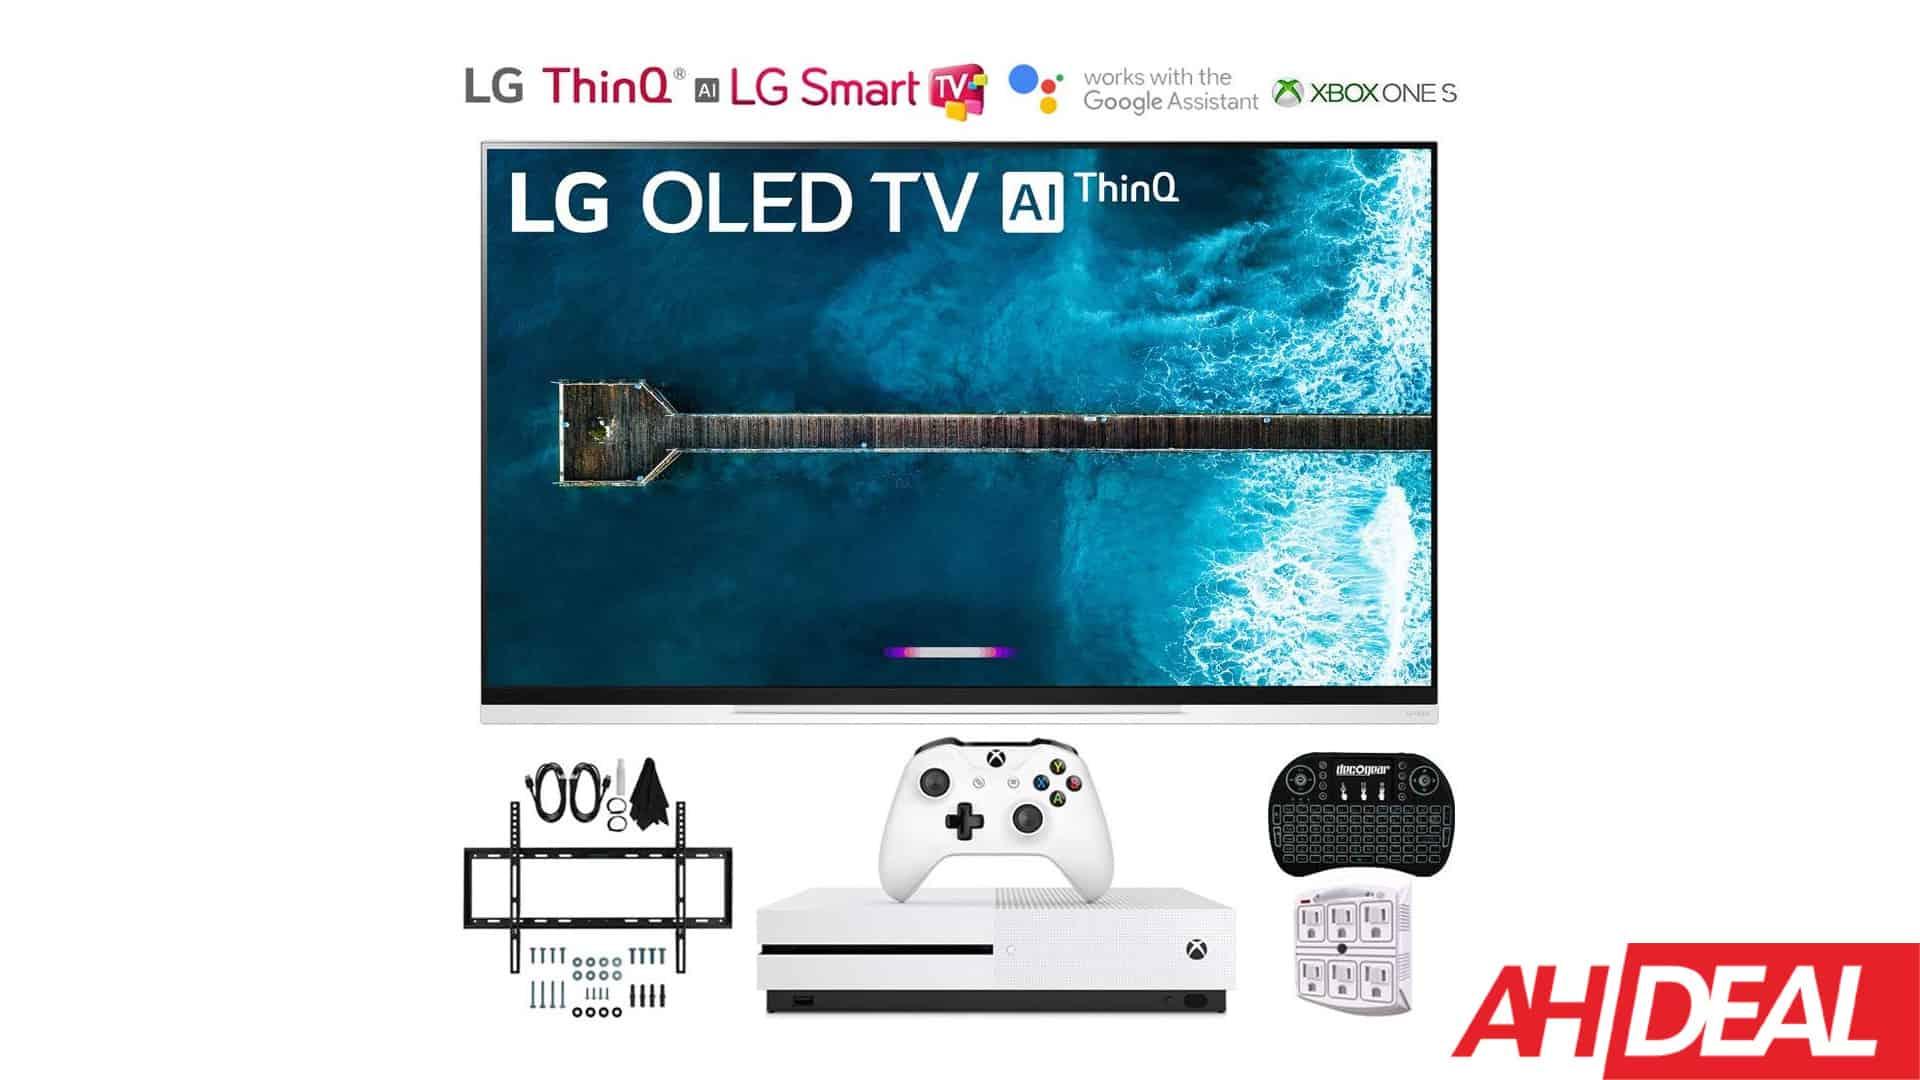 58929 LG 4K Smart TV & Xbox One S Bundle For $1,997 – Amazon Black Friday 2019 Deals